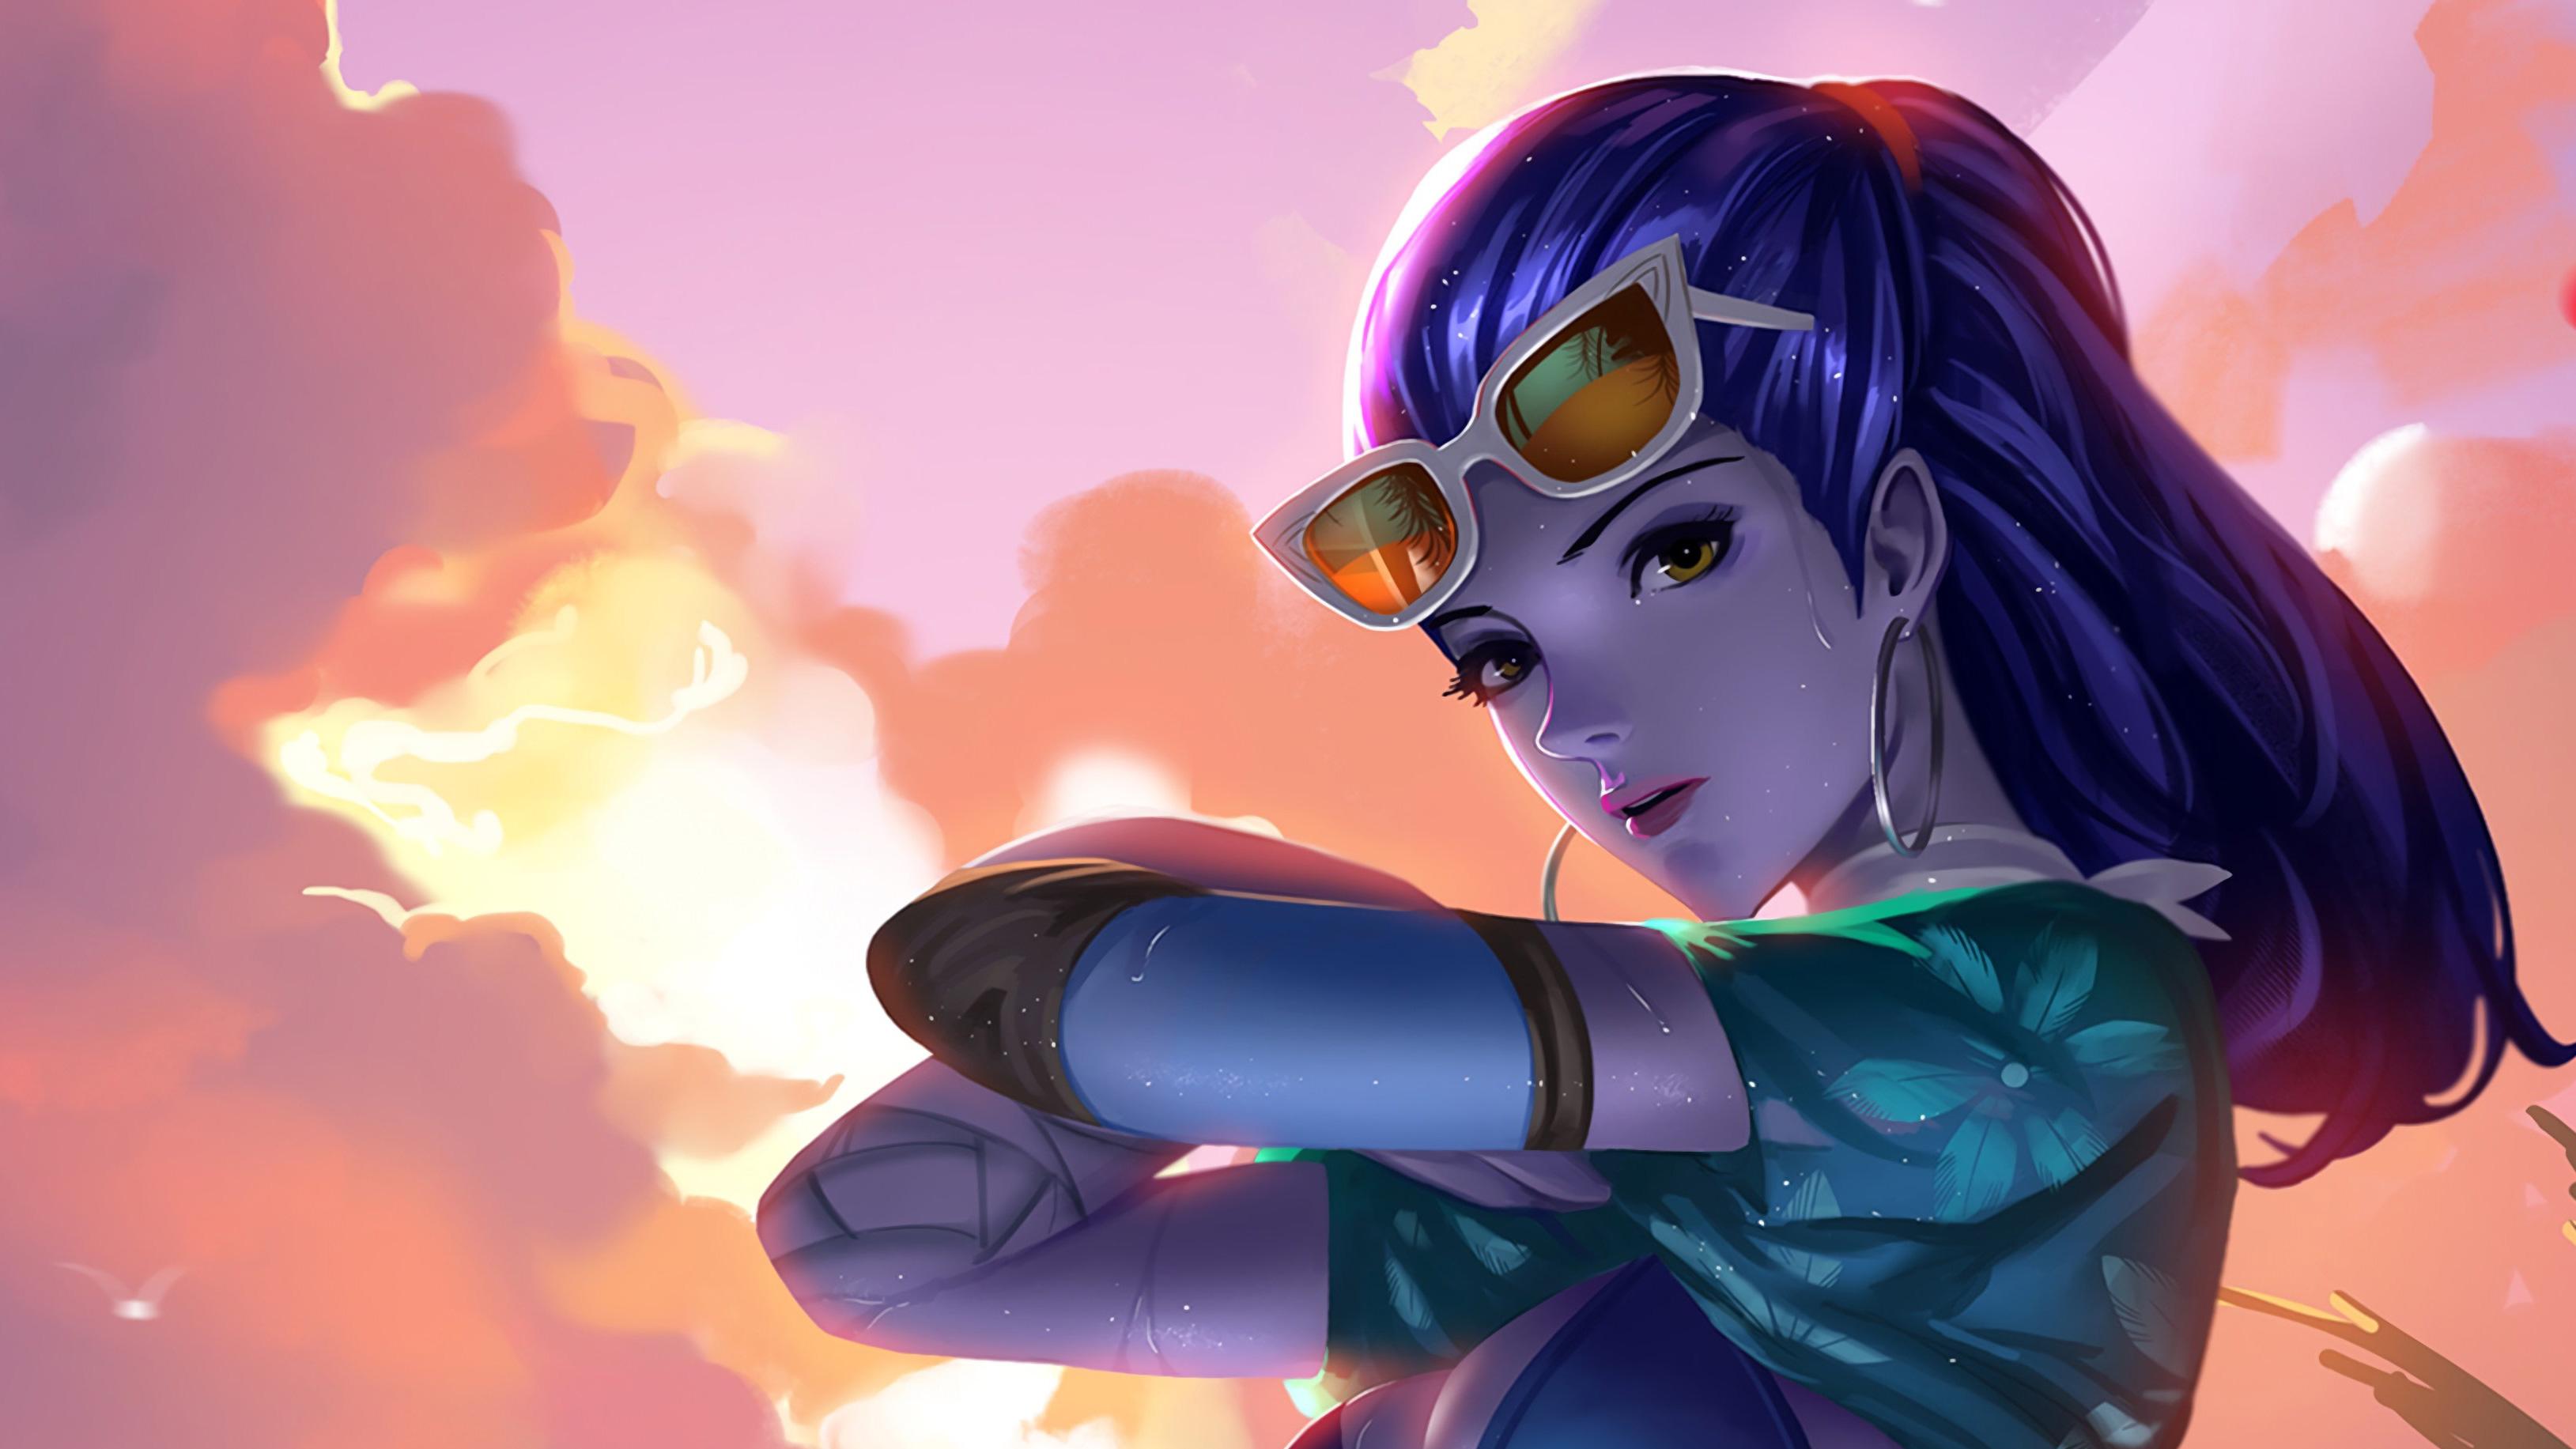 Cool Girls Overwatch Wallpapers Cote Dazur Widowmaker Overwatch Artwork 4k Hd Games 4k